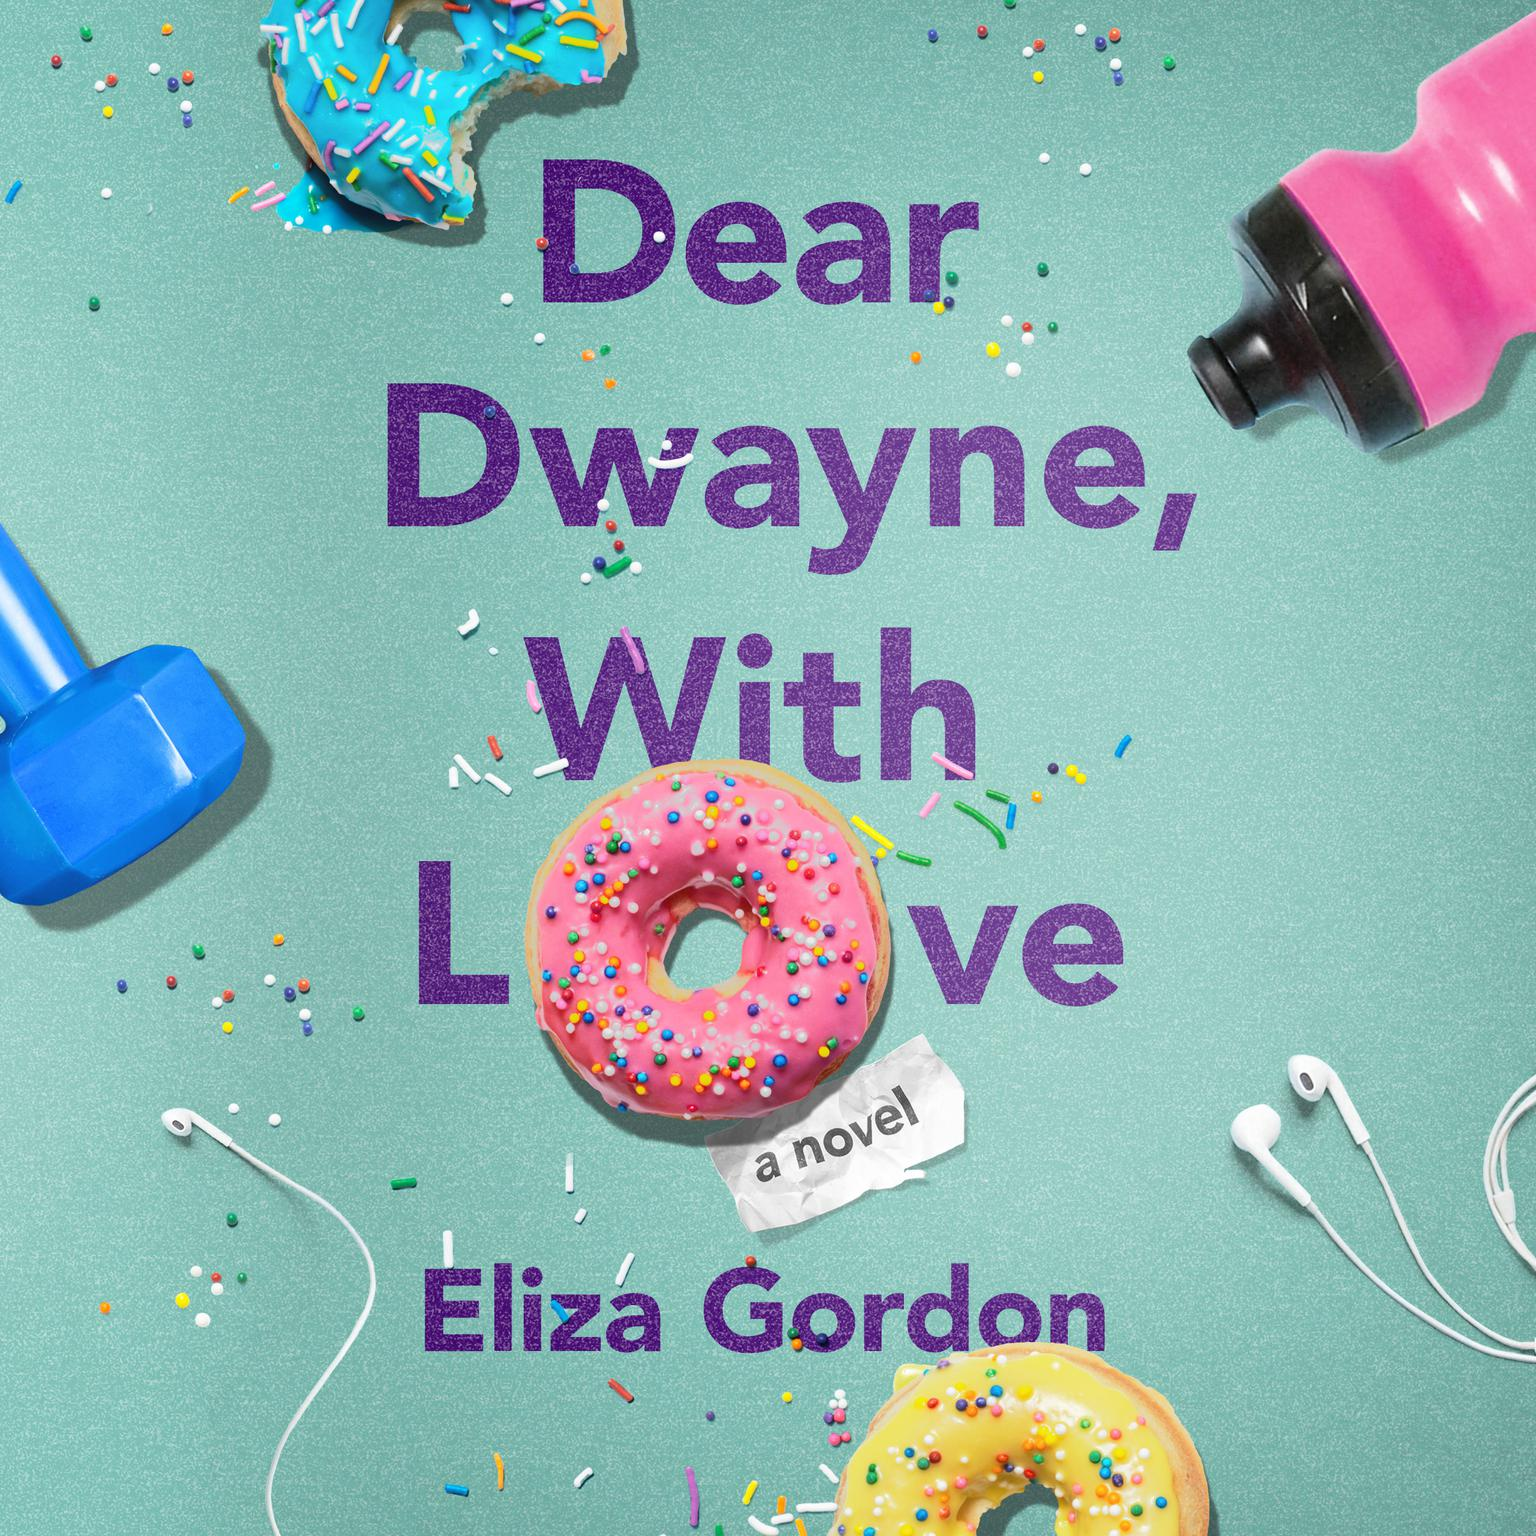 Dear Dwayne, With Love Audiobook, by Eliza Gordon